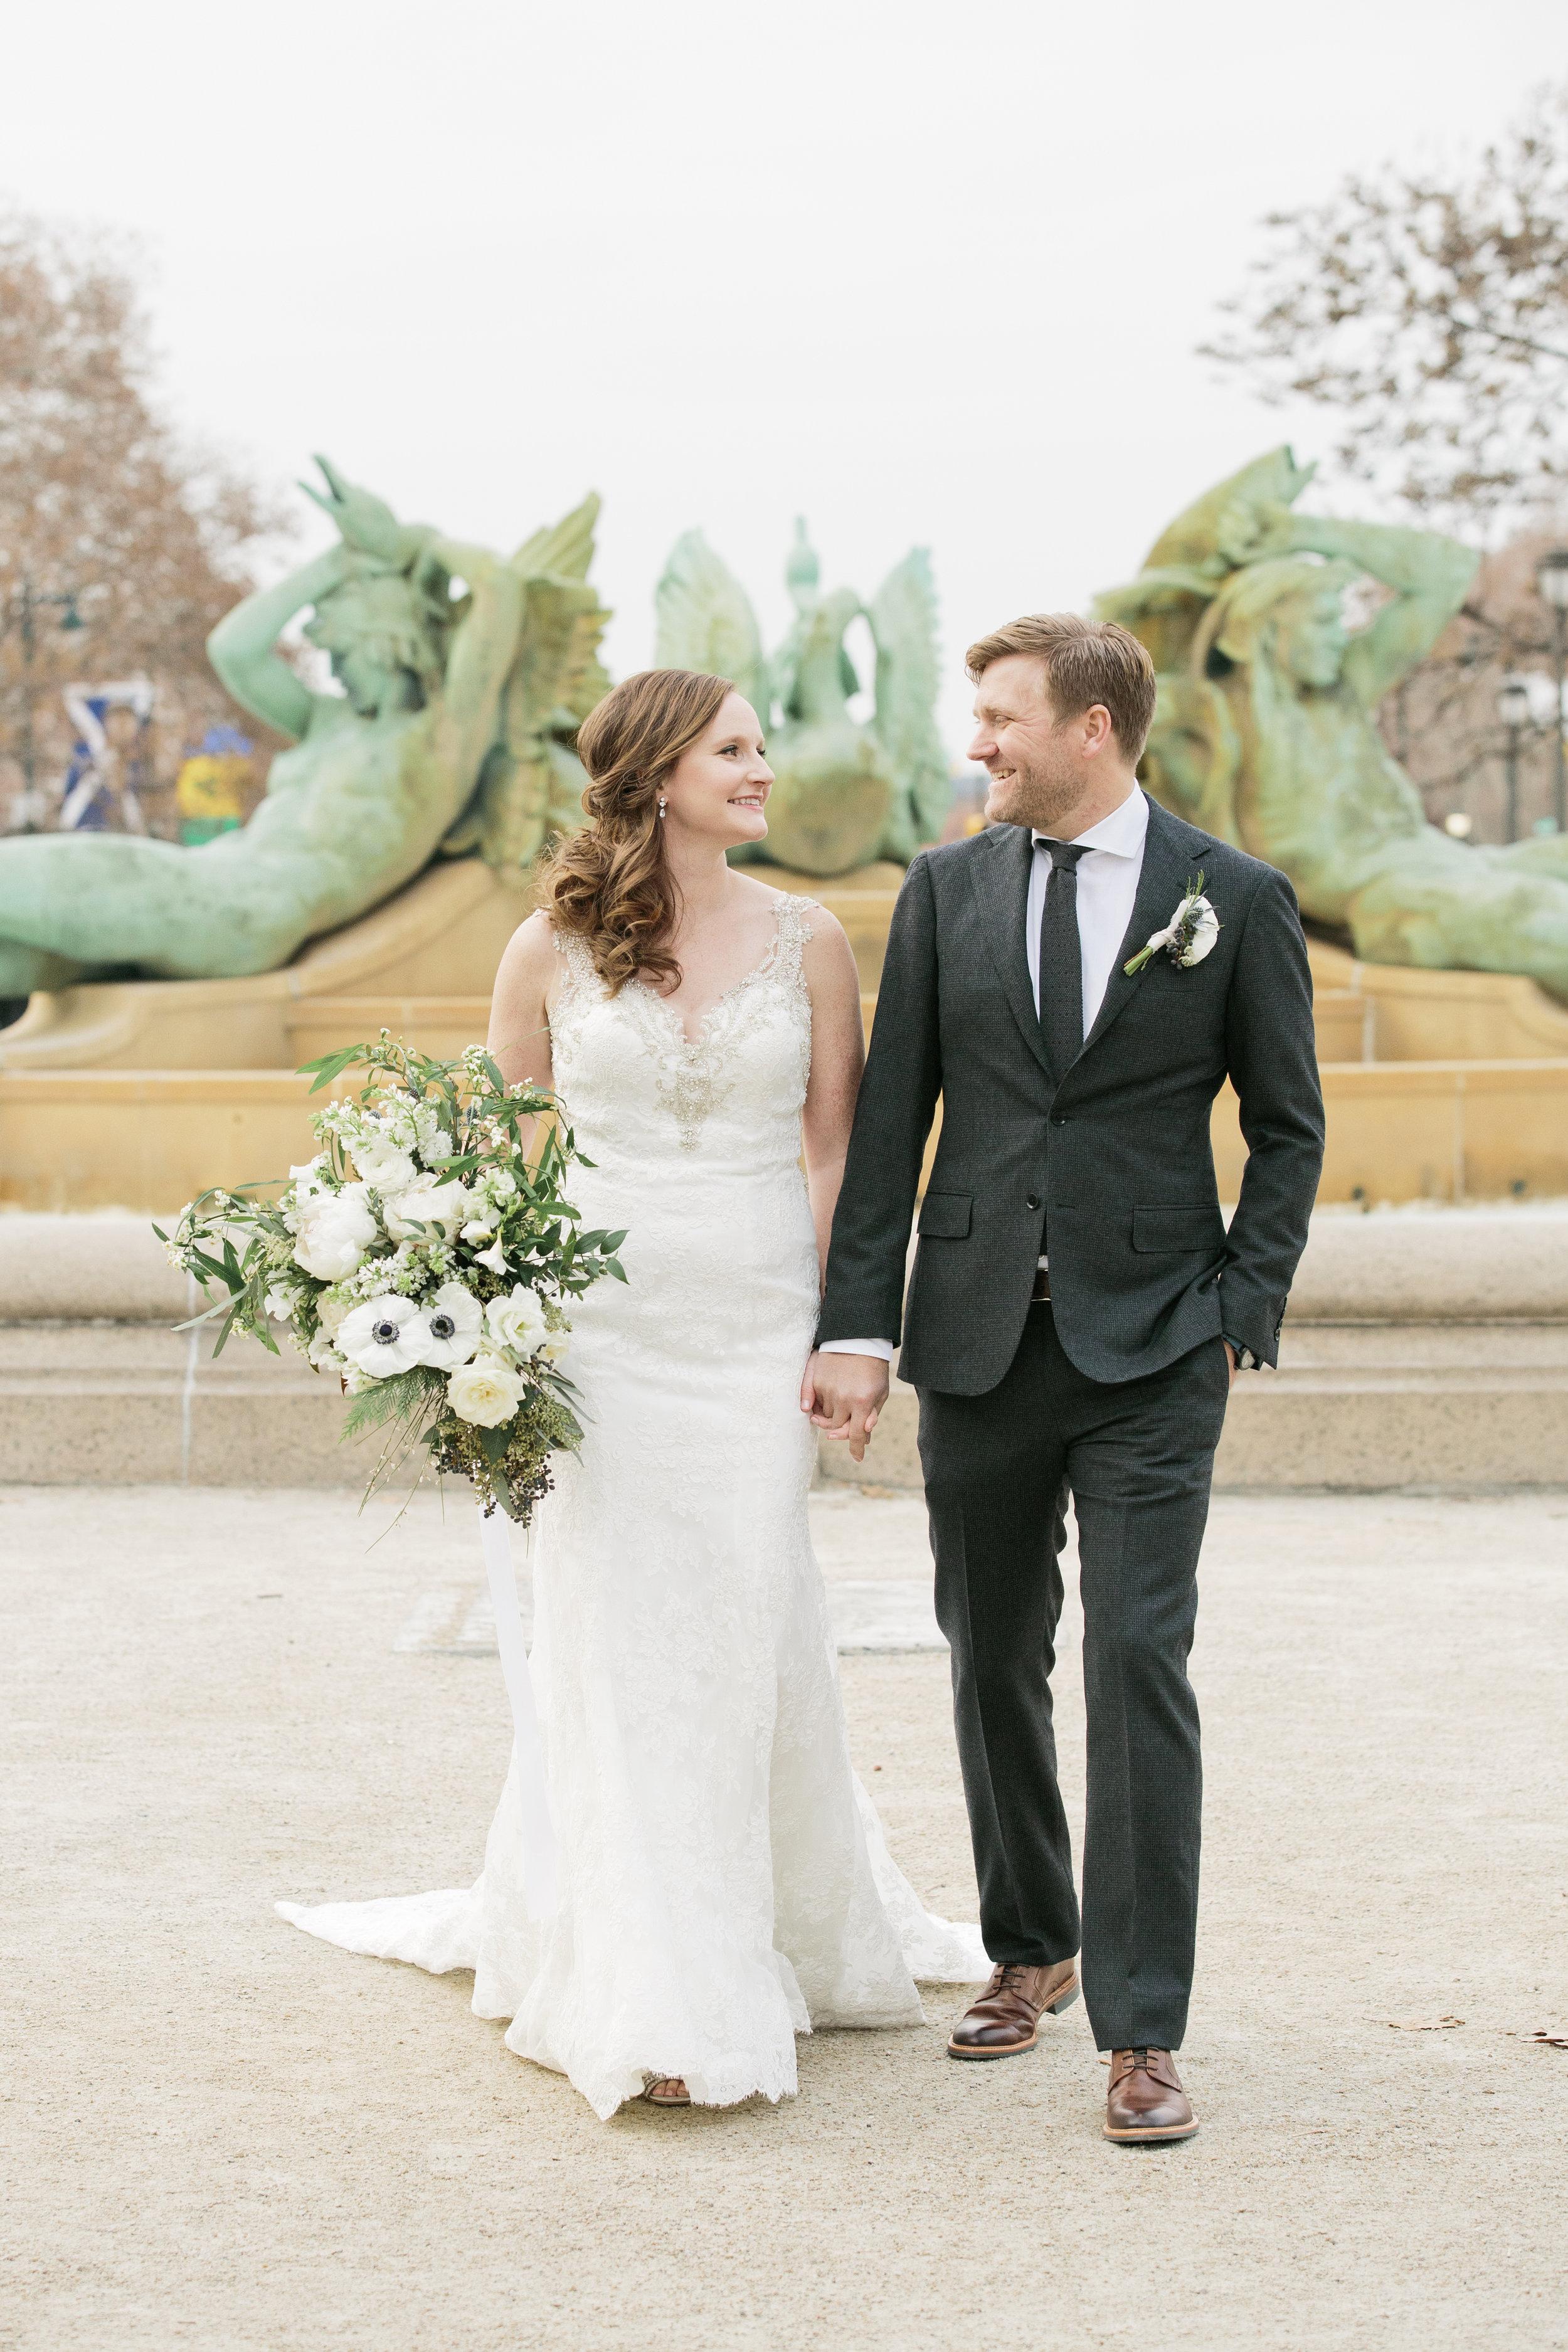 Hudson-Nichols-Martha-Stewart-Weddings-Winter-Ski-Philadelphia-Claire-Conner_047.jpg